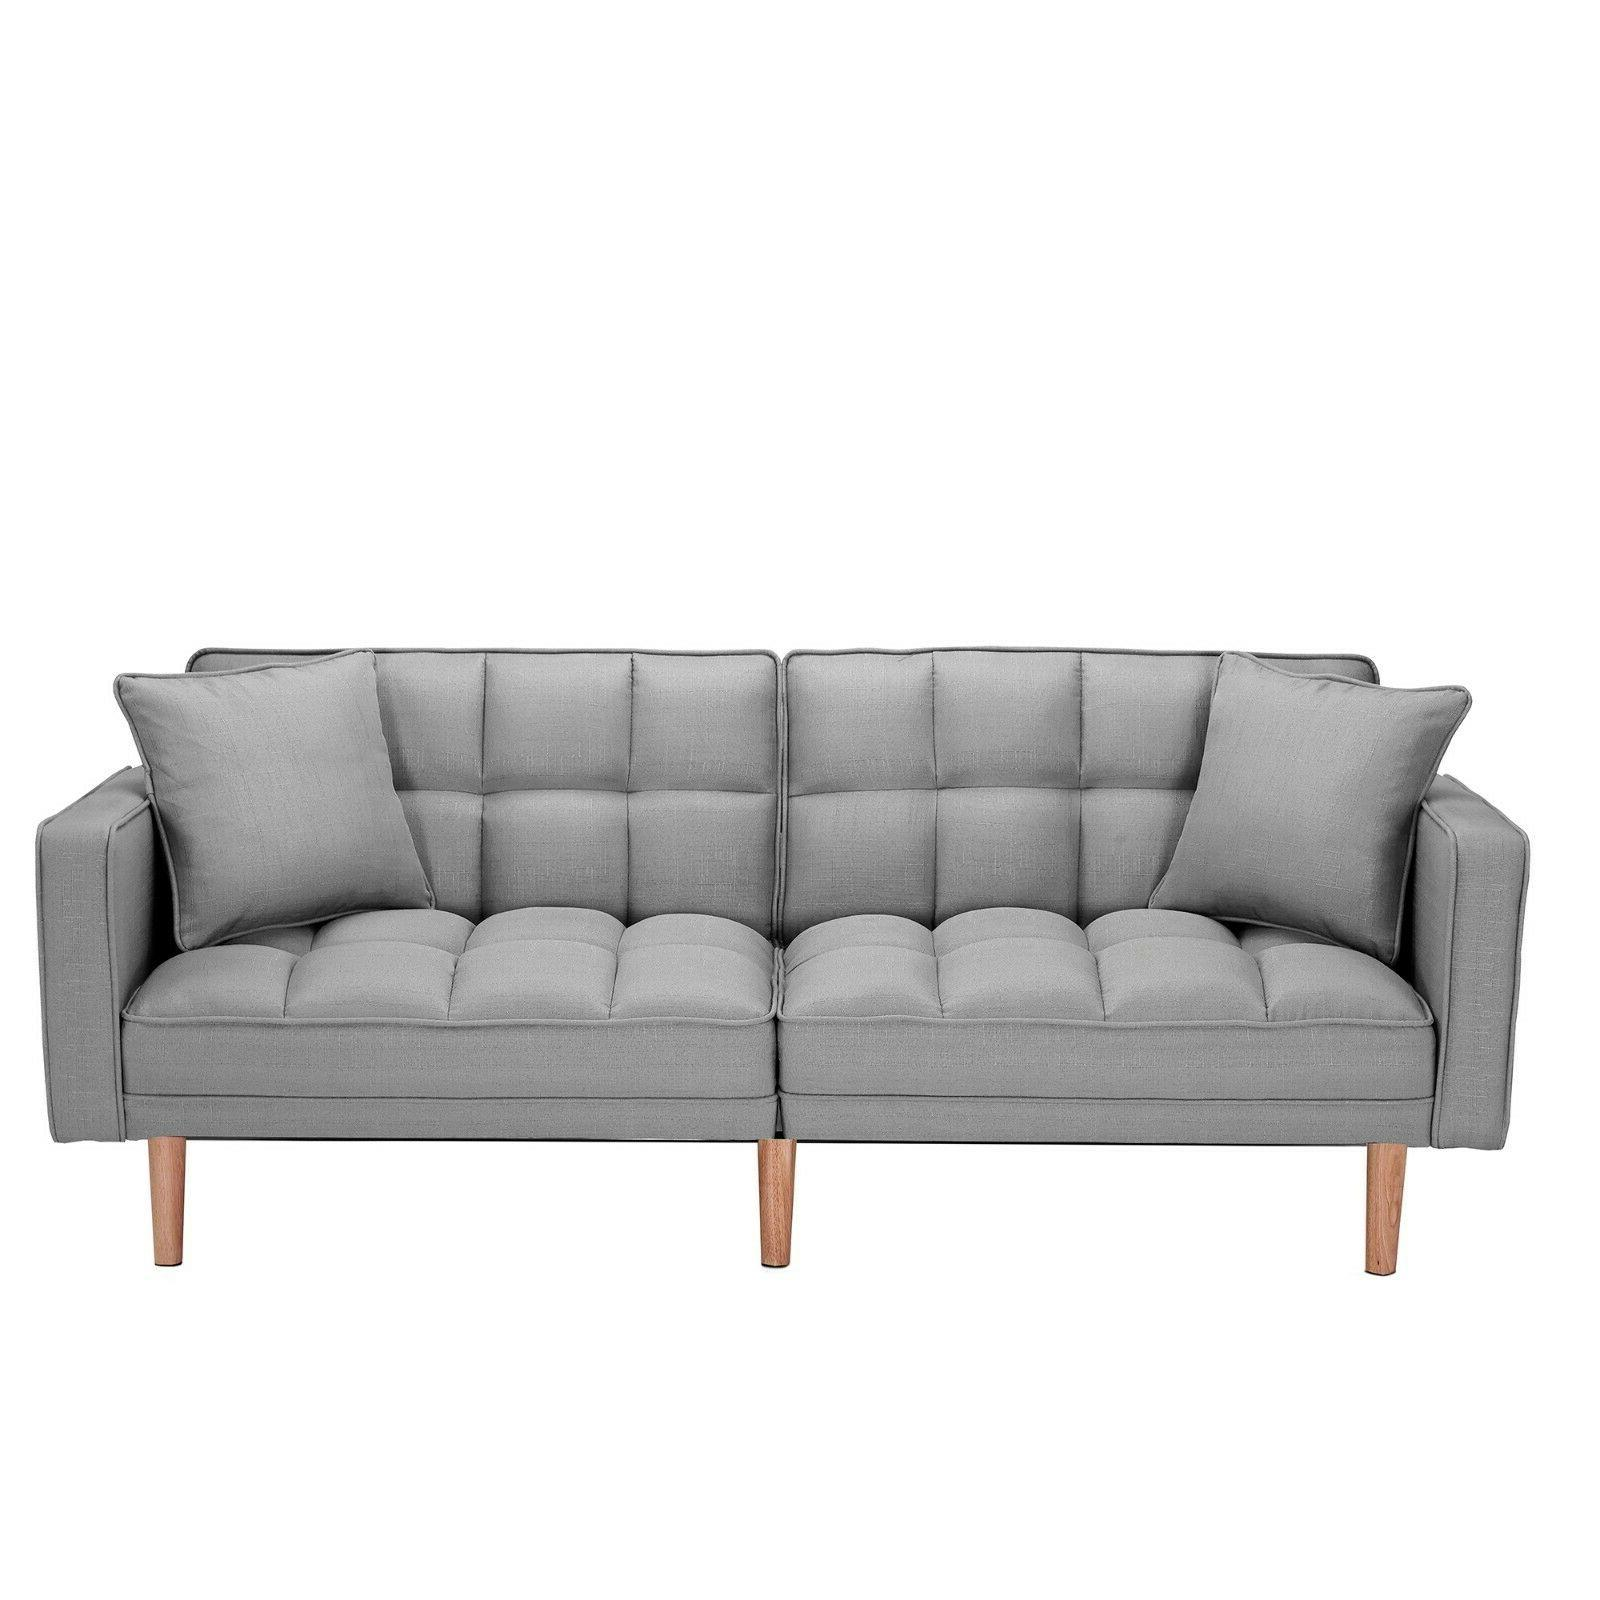 Modern Futon Pillows Folding Lounge Sofa